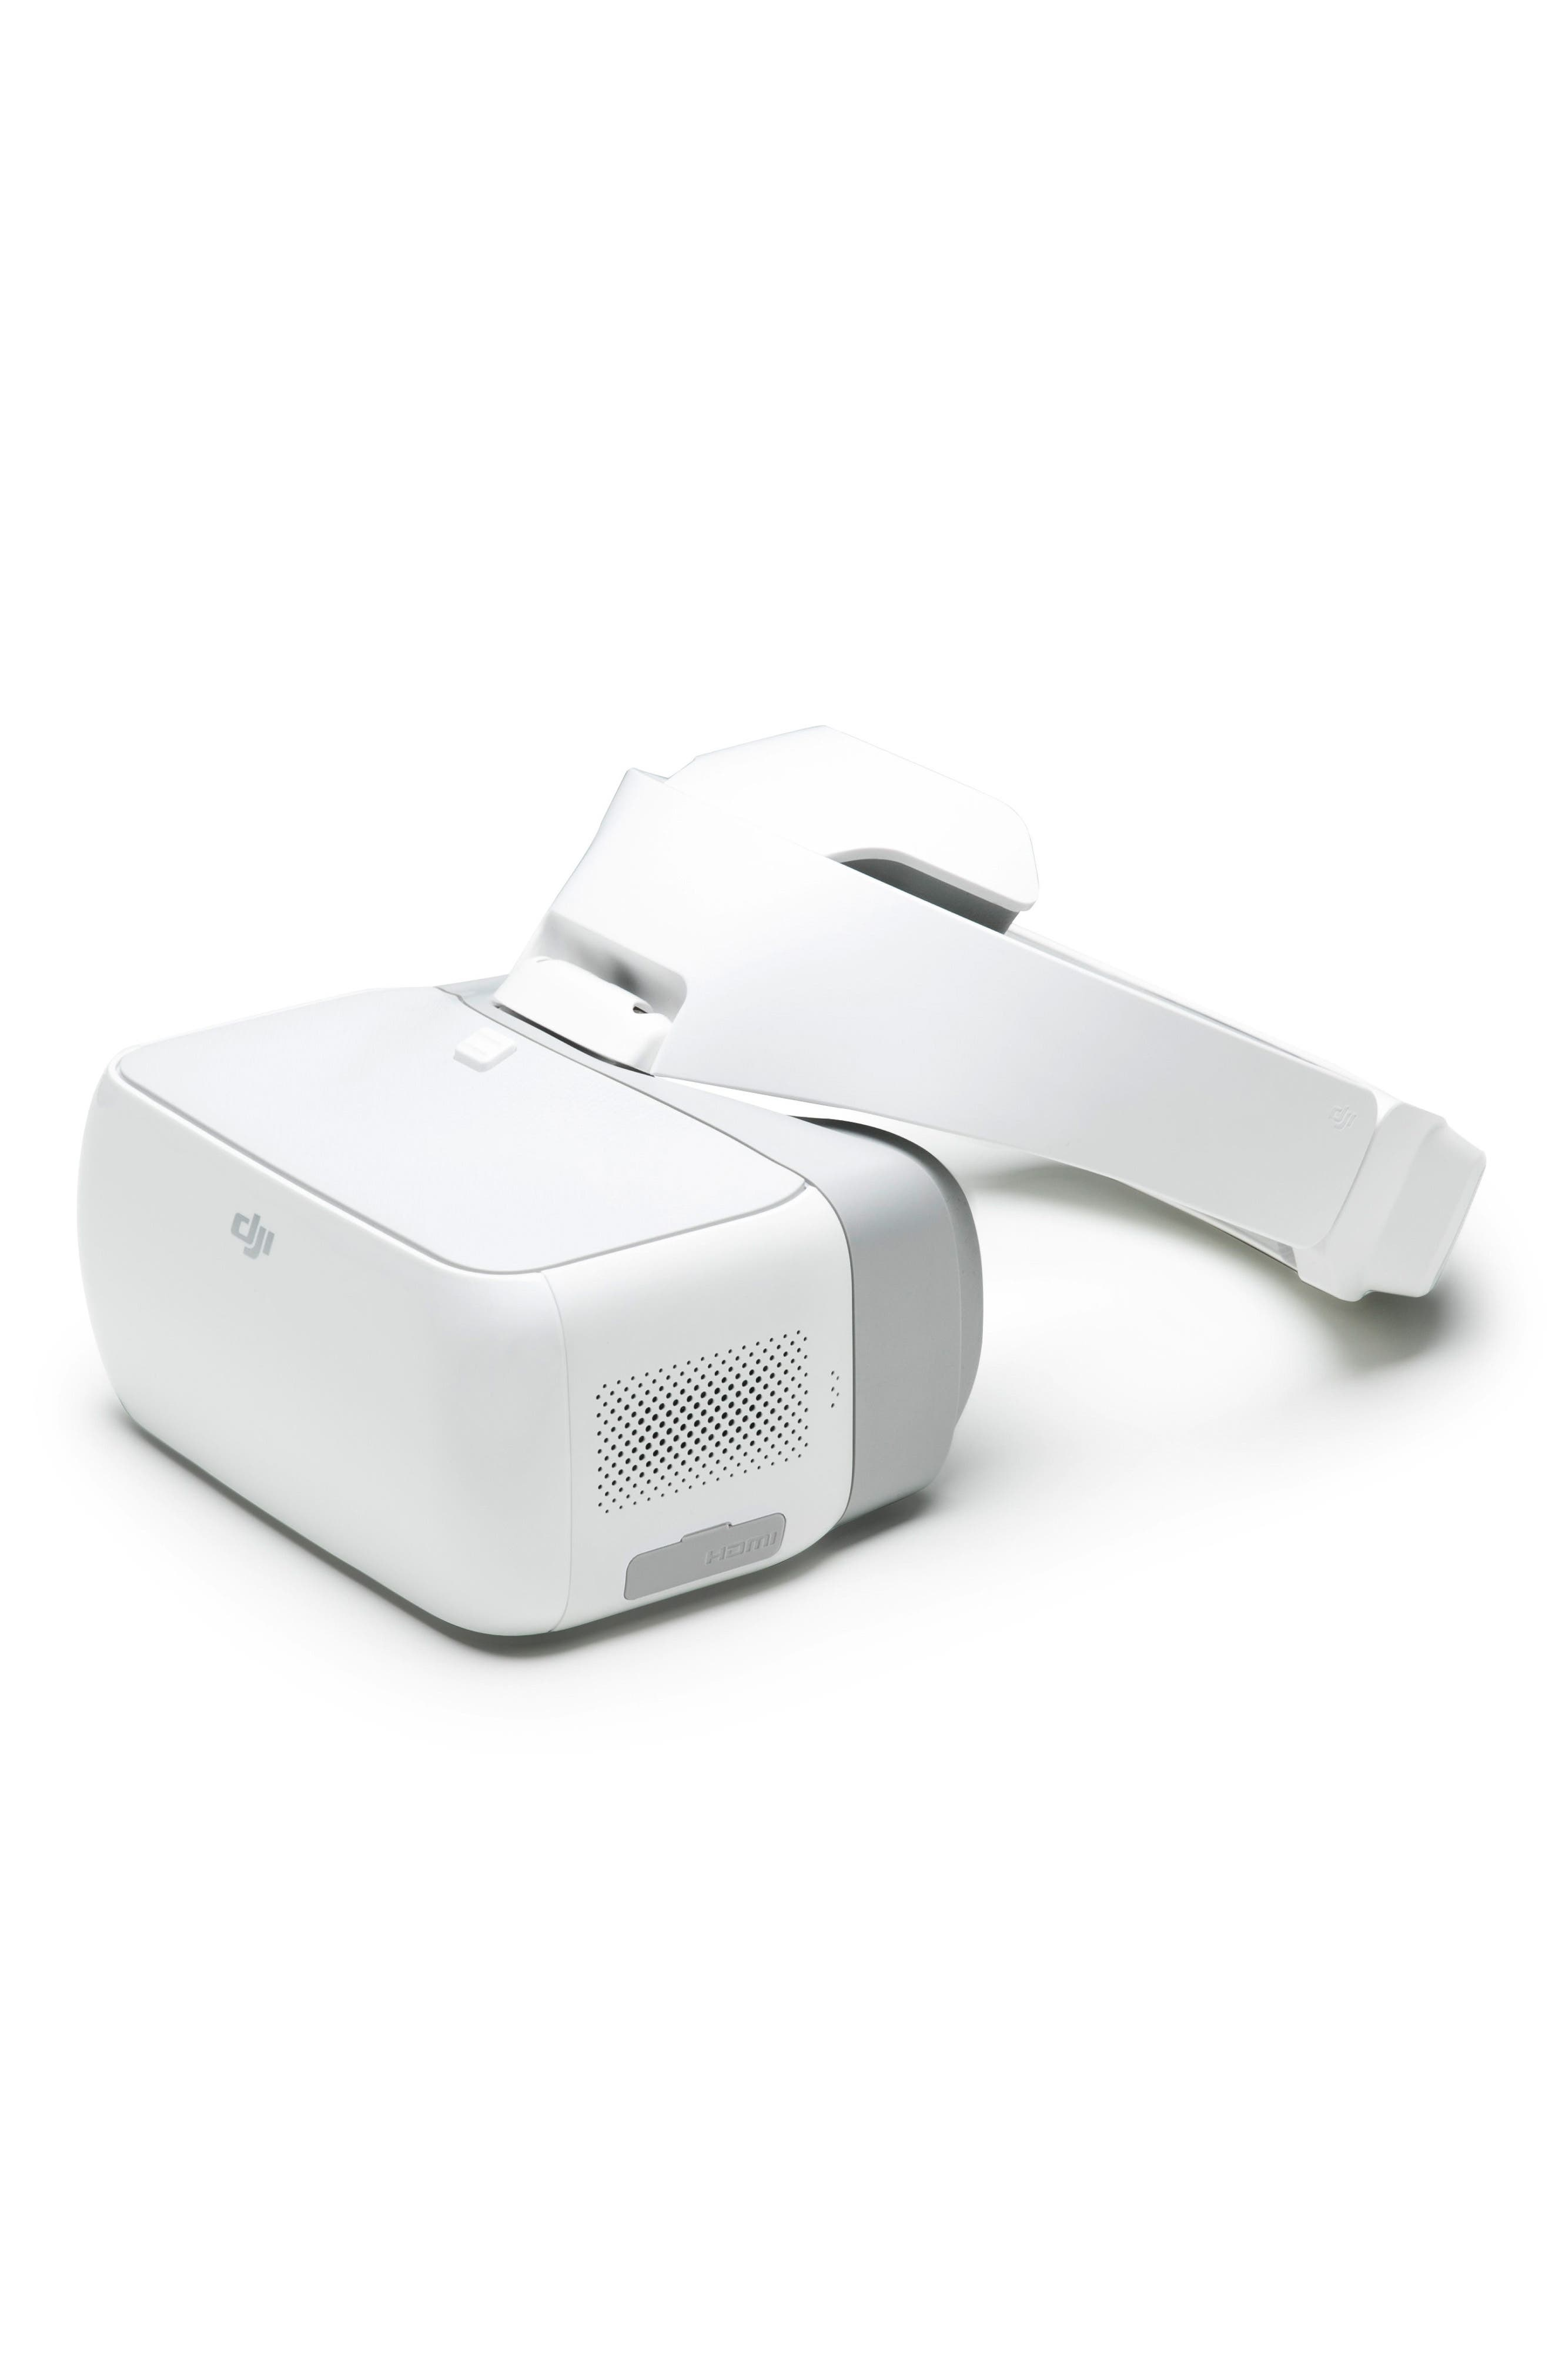 FPV Drone Goggles,                             Alternate thumbnail 2, color,                             100